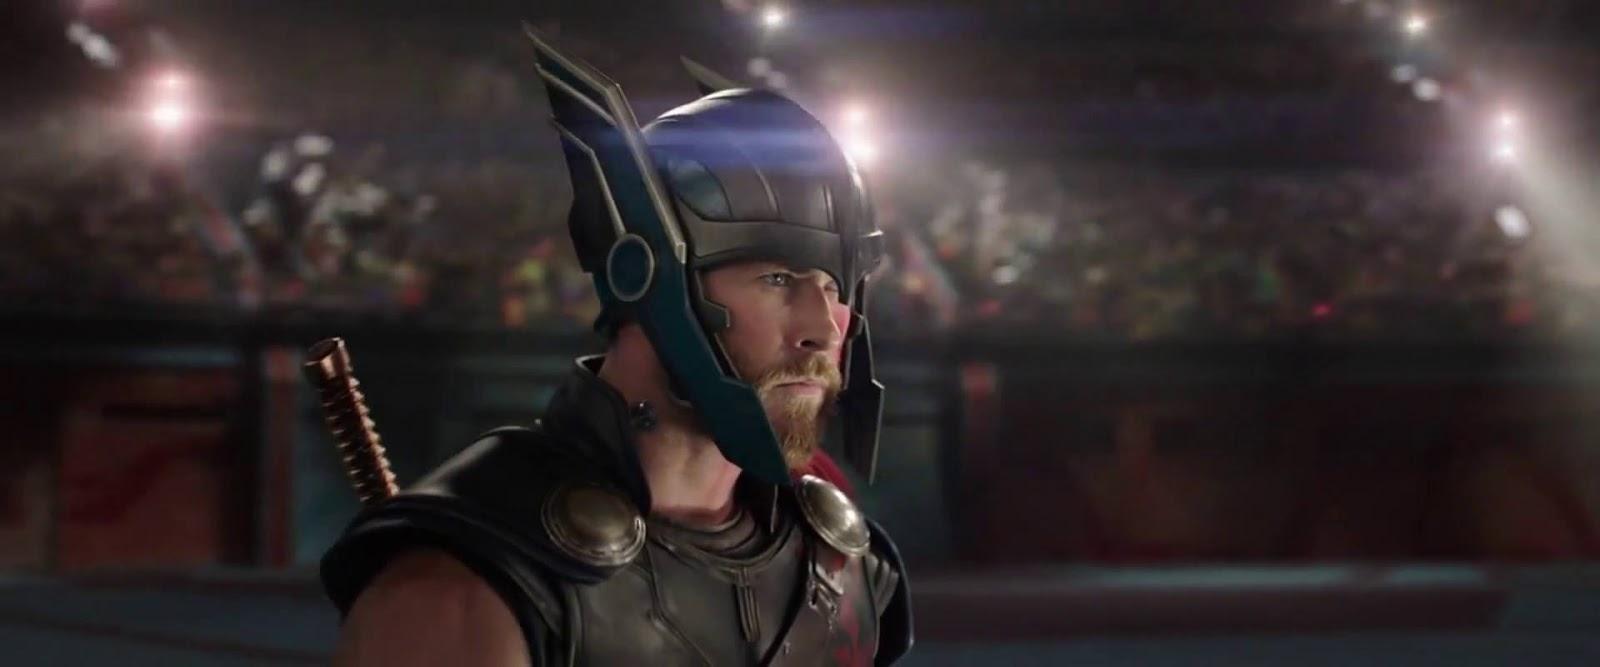 Thor Ragnarok Full Movie Download In Hindi Watch Online Hd